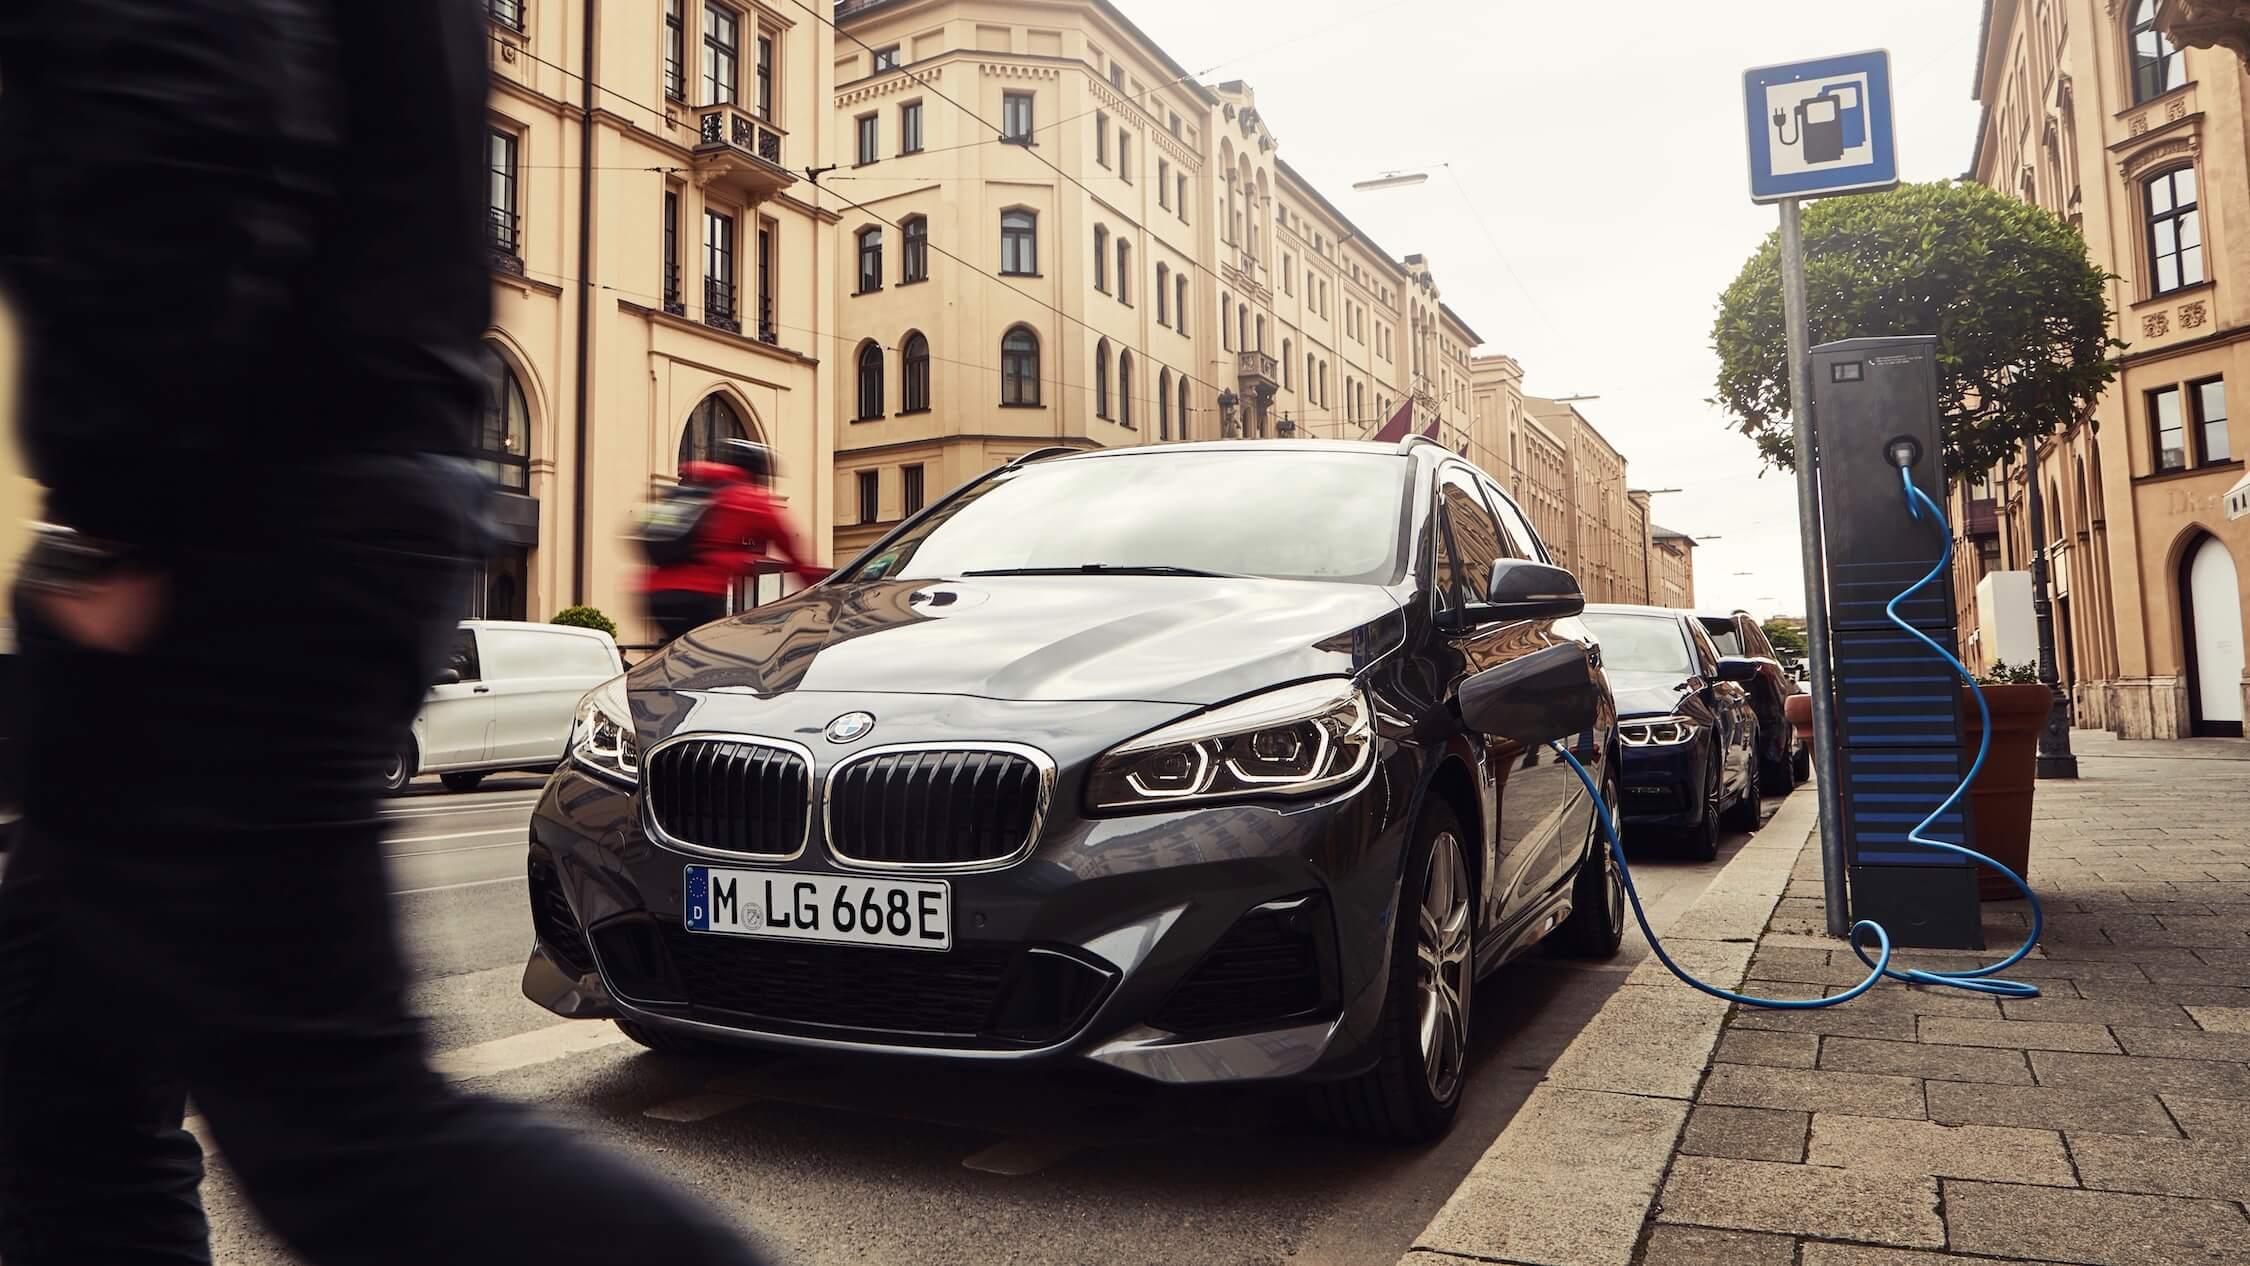 Carregar BMW 225xe híbrido